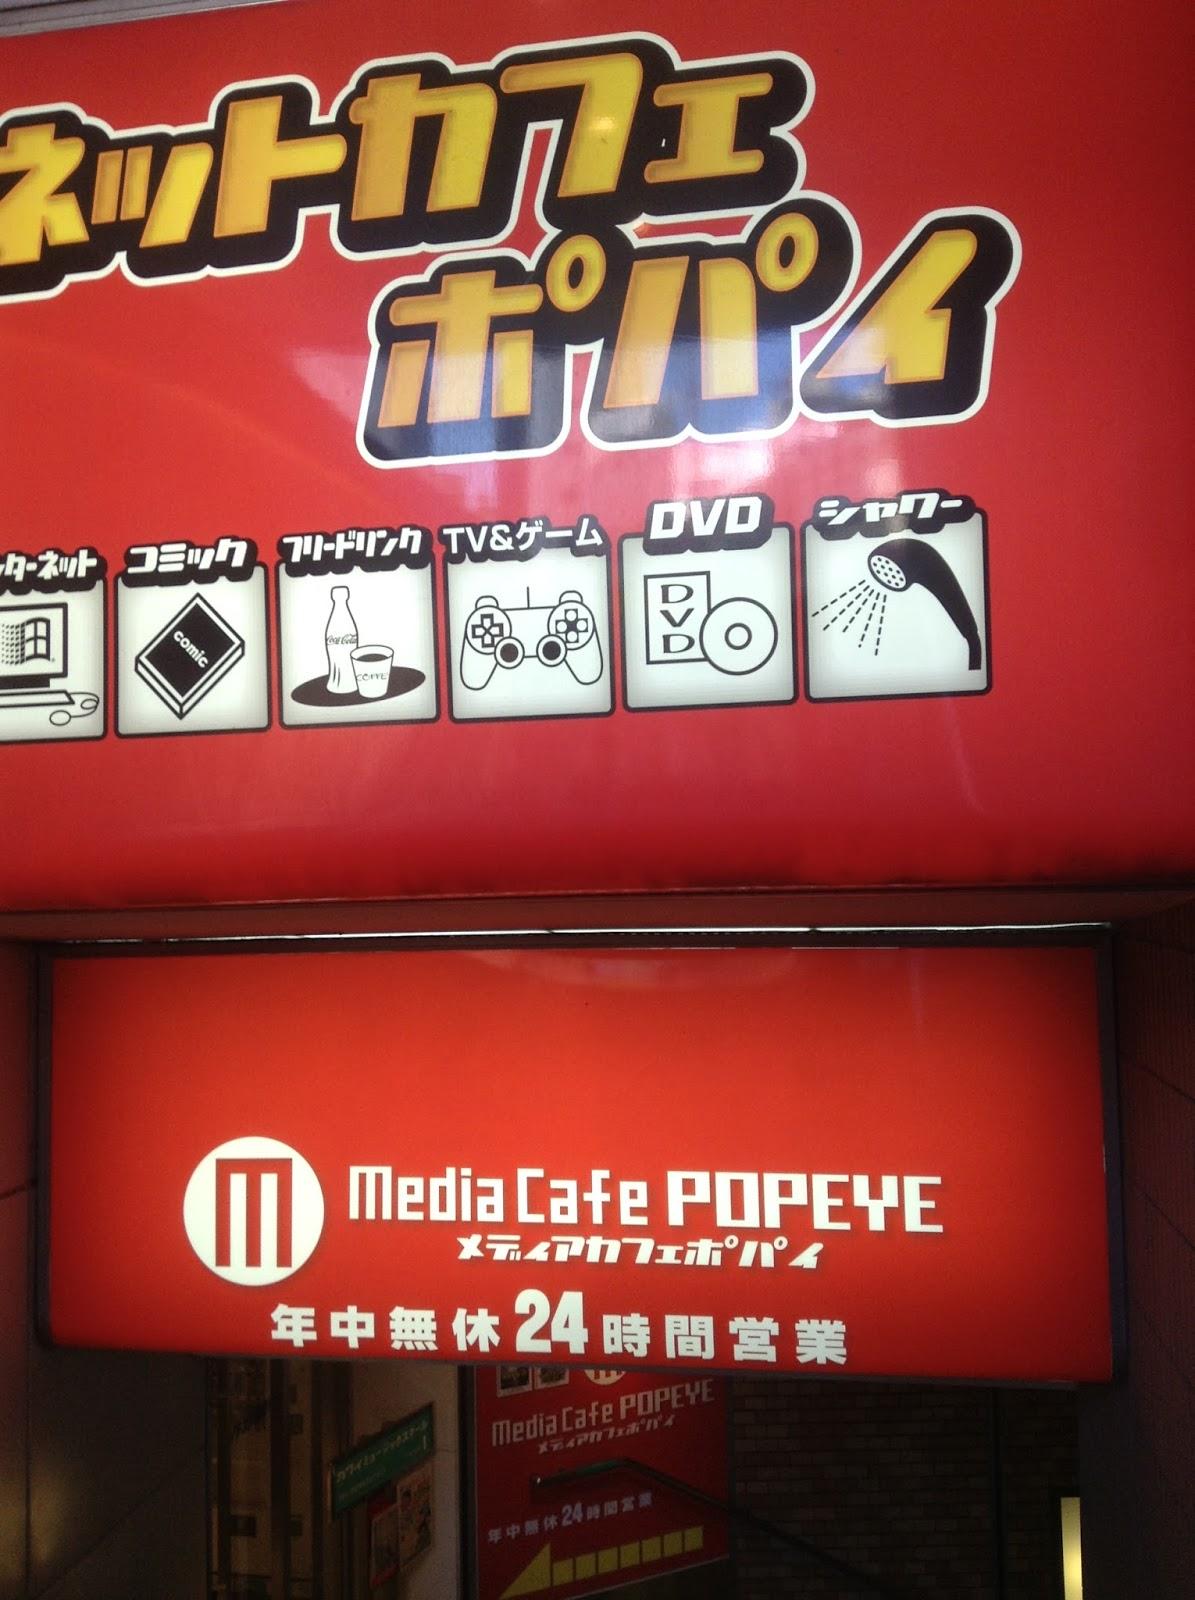 Manga cafe Japan